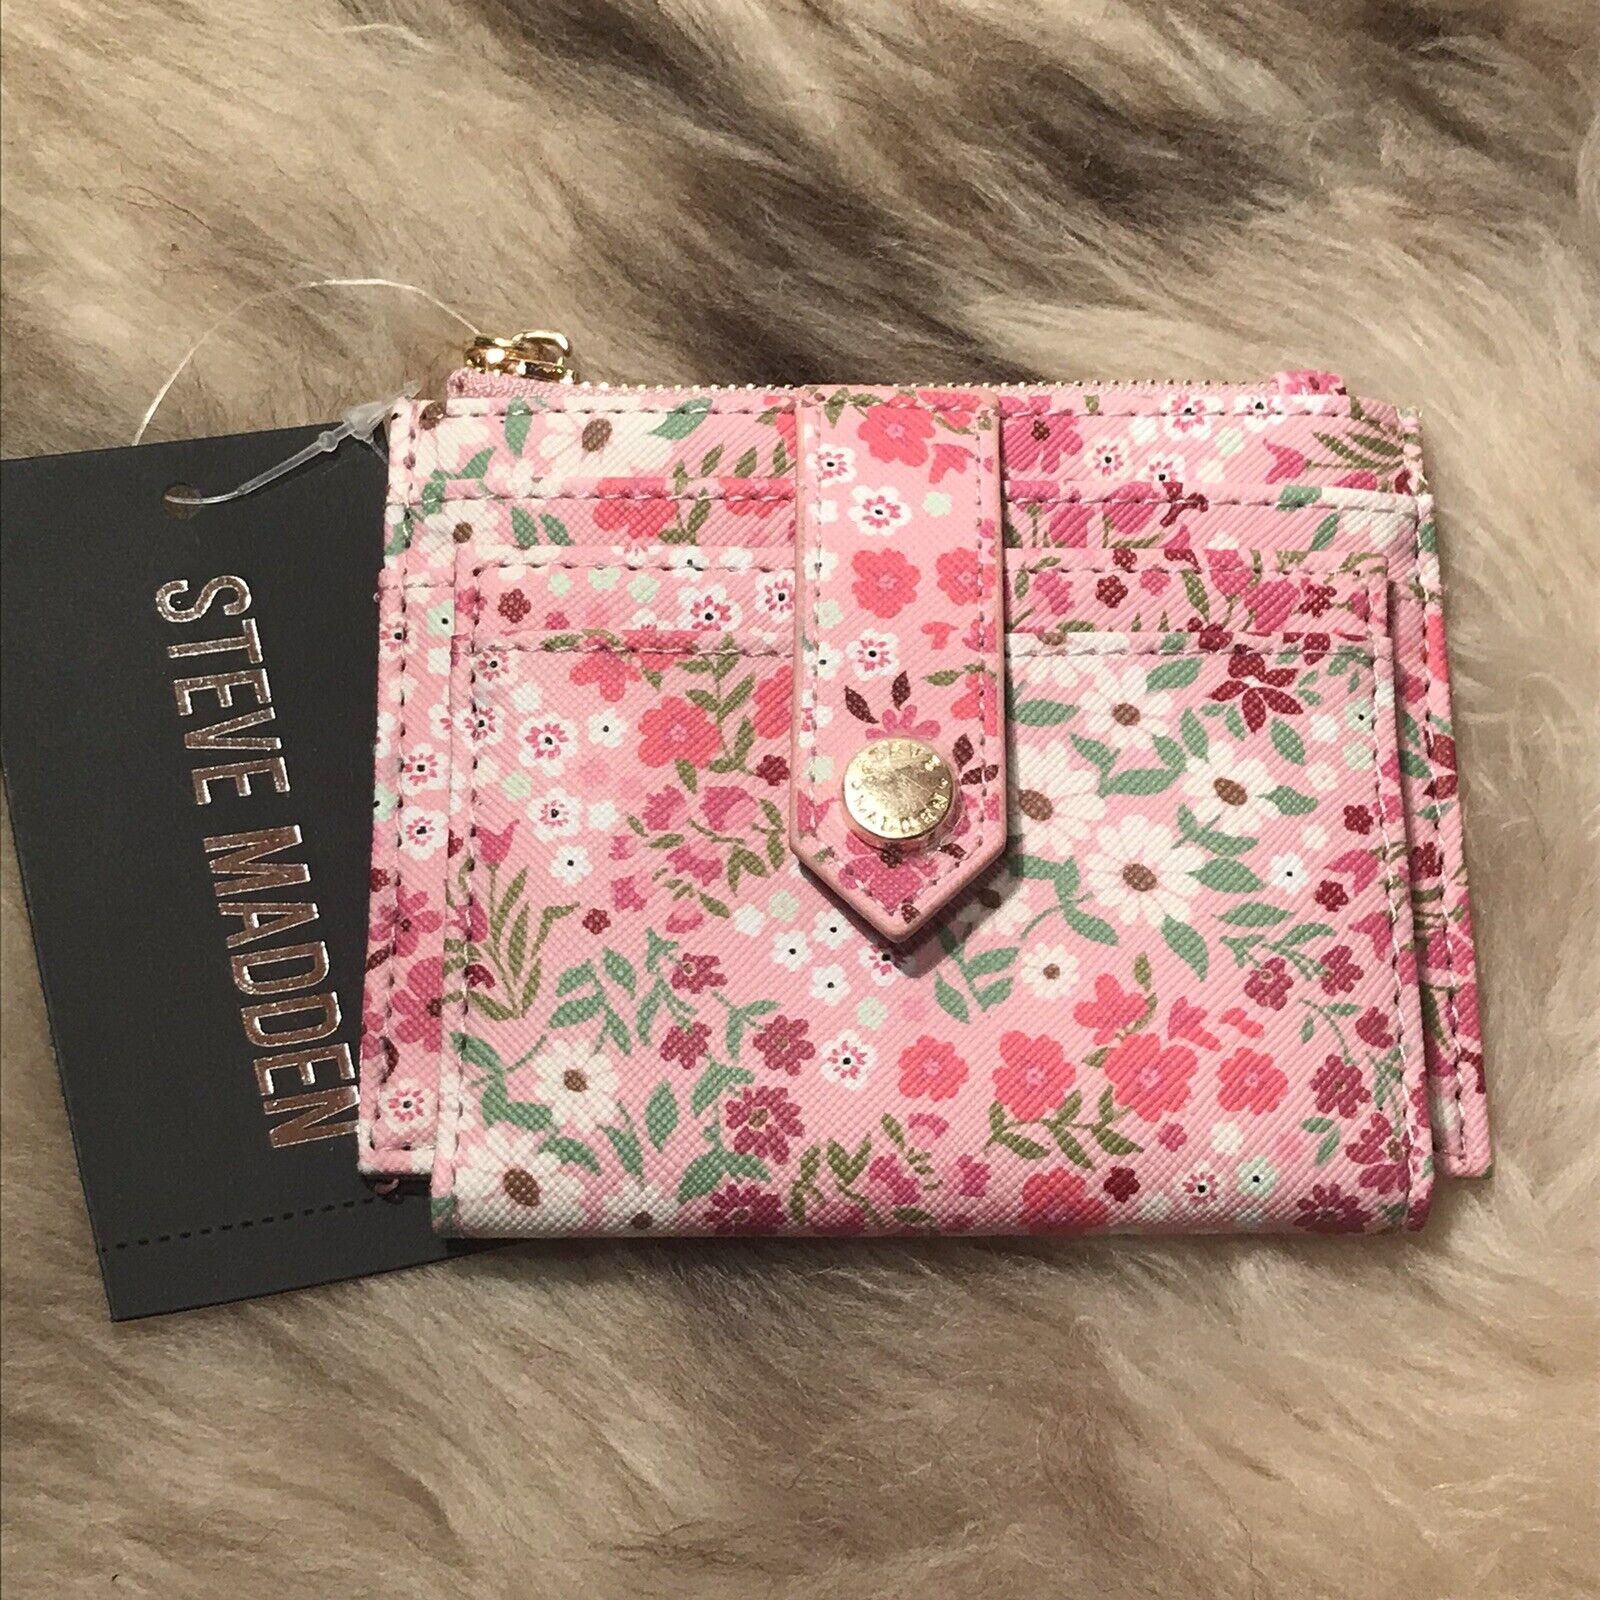 NWT Steve Madden Bhayden Card Case Wallet - Pretty Floral On Blush Print